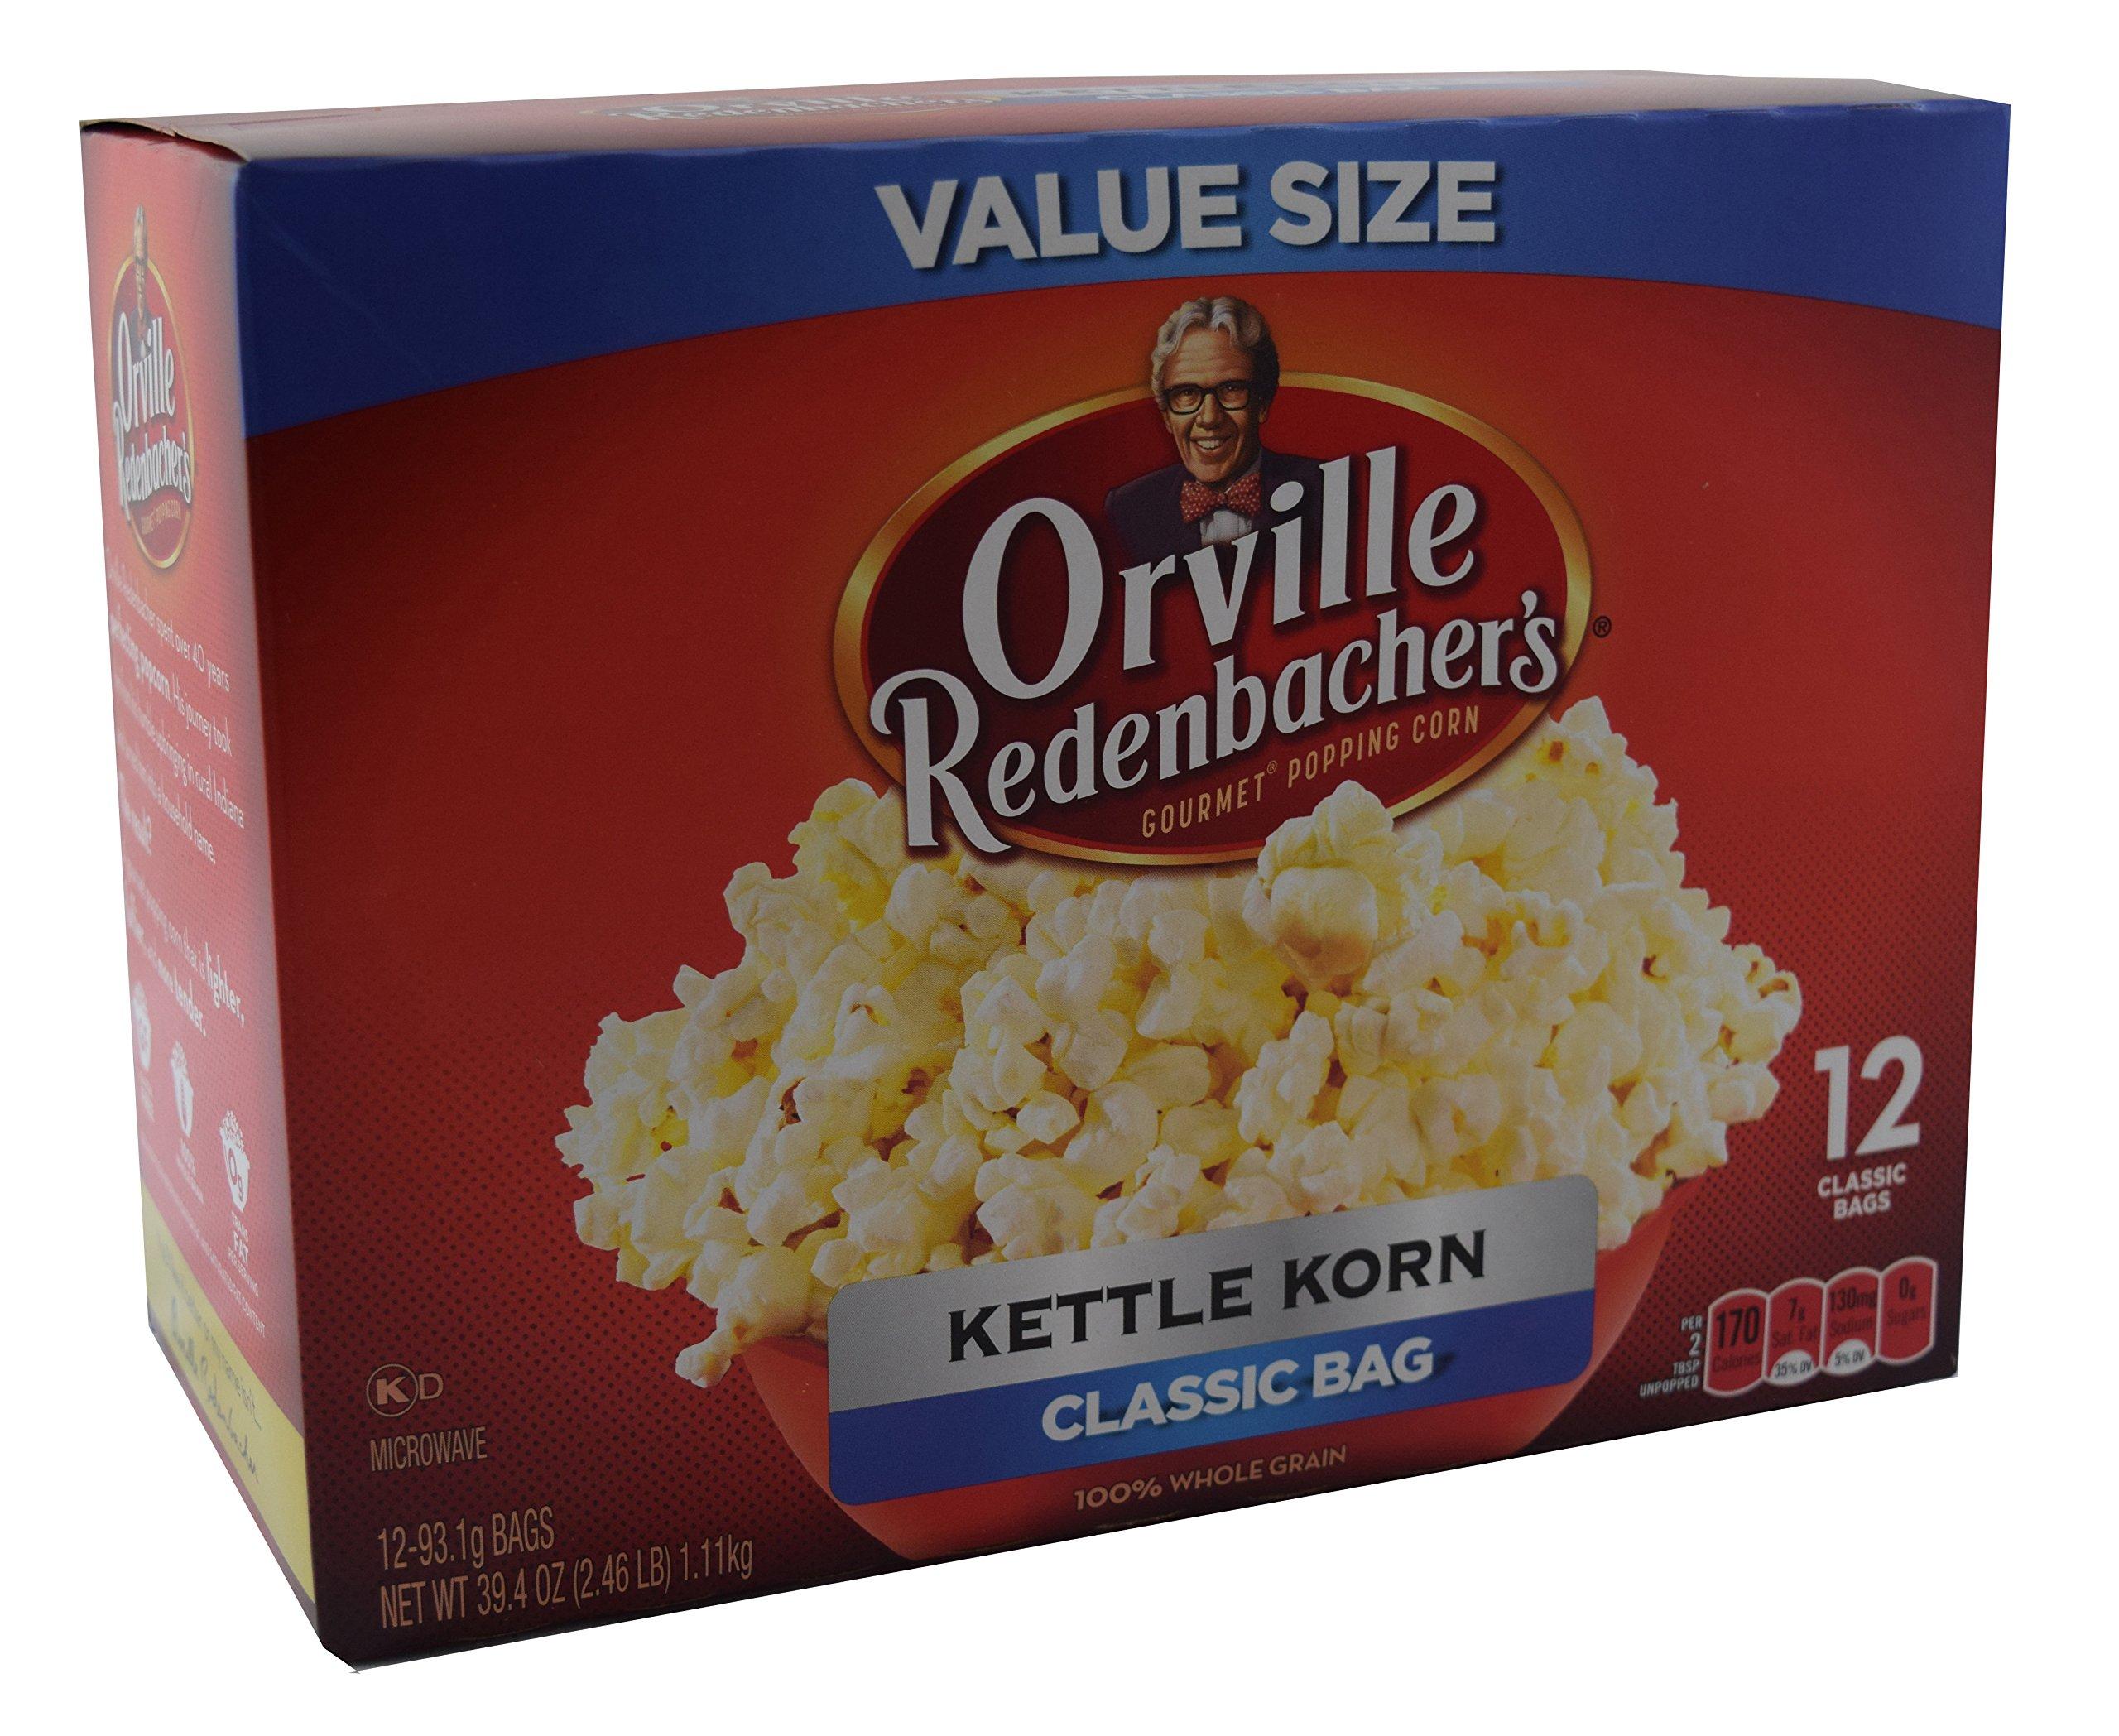 Orville Redenbachers Kettle Korn Classic Bag, 12-Count Box by Orville Redenbacher's